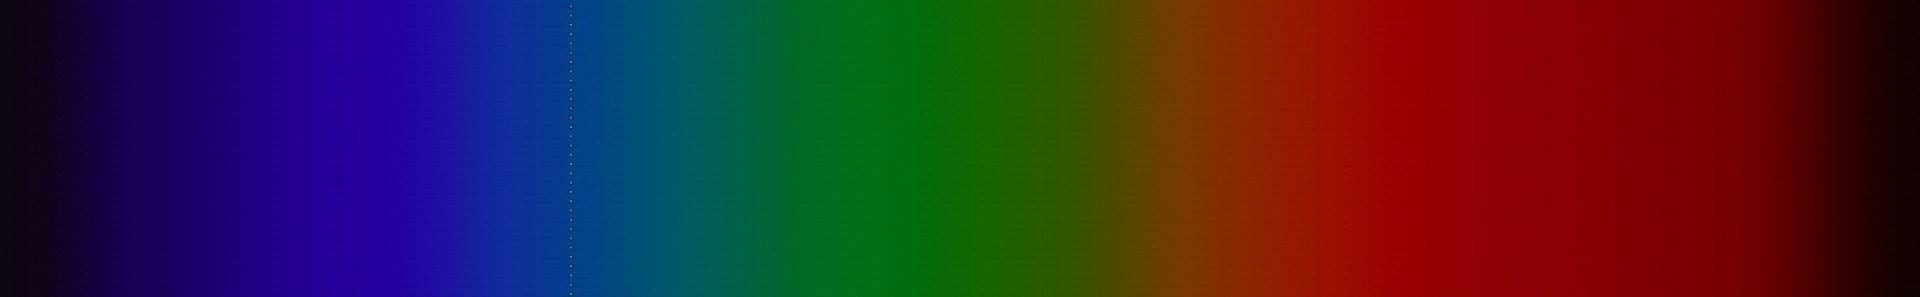 IMG_8321_Capella_Spektrum_breit.jpg